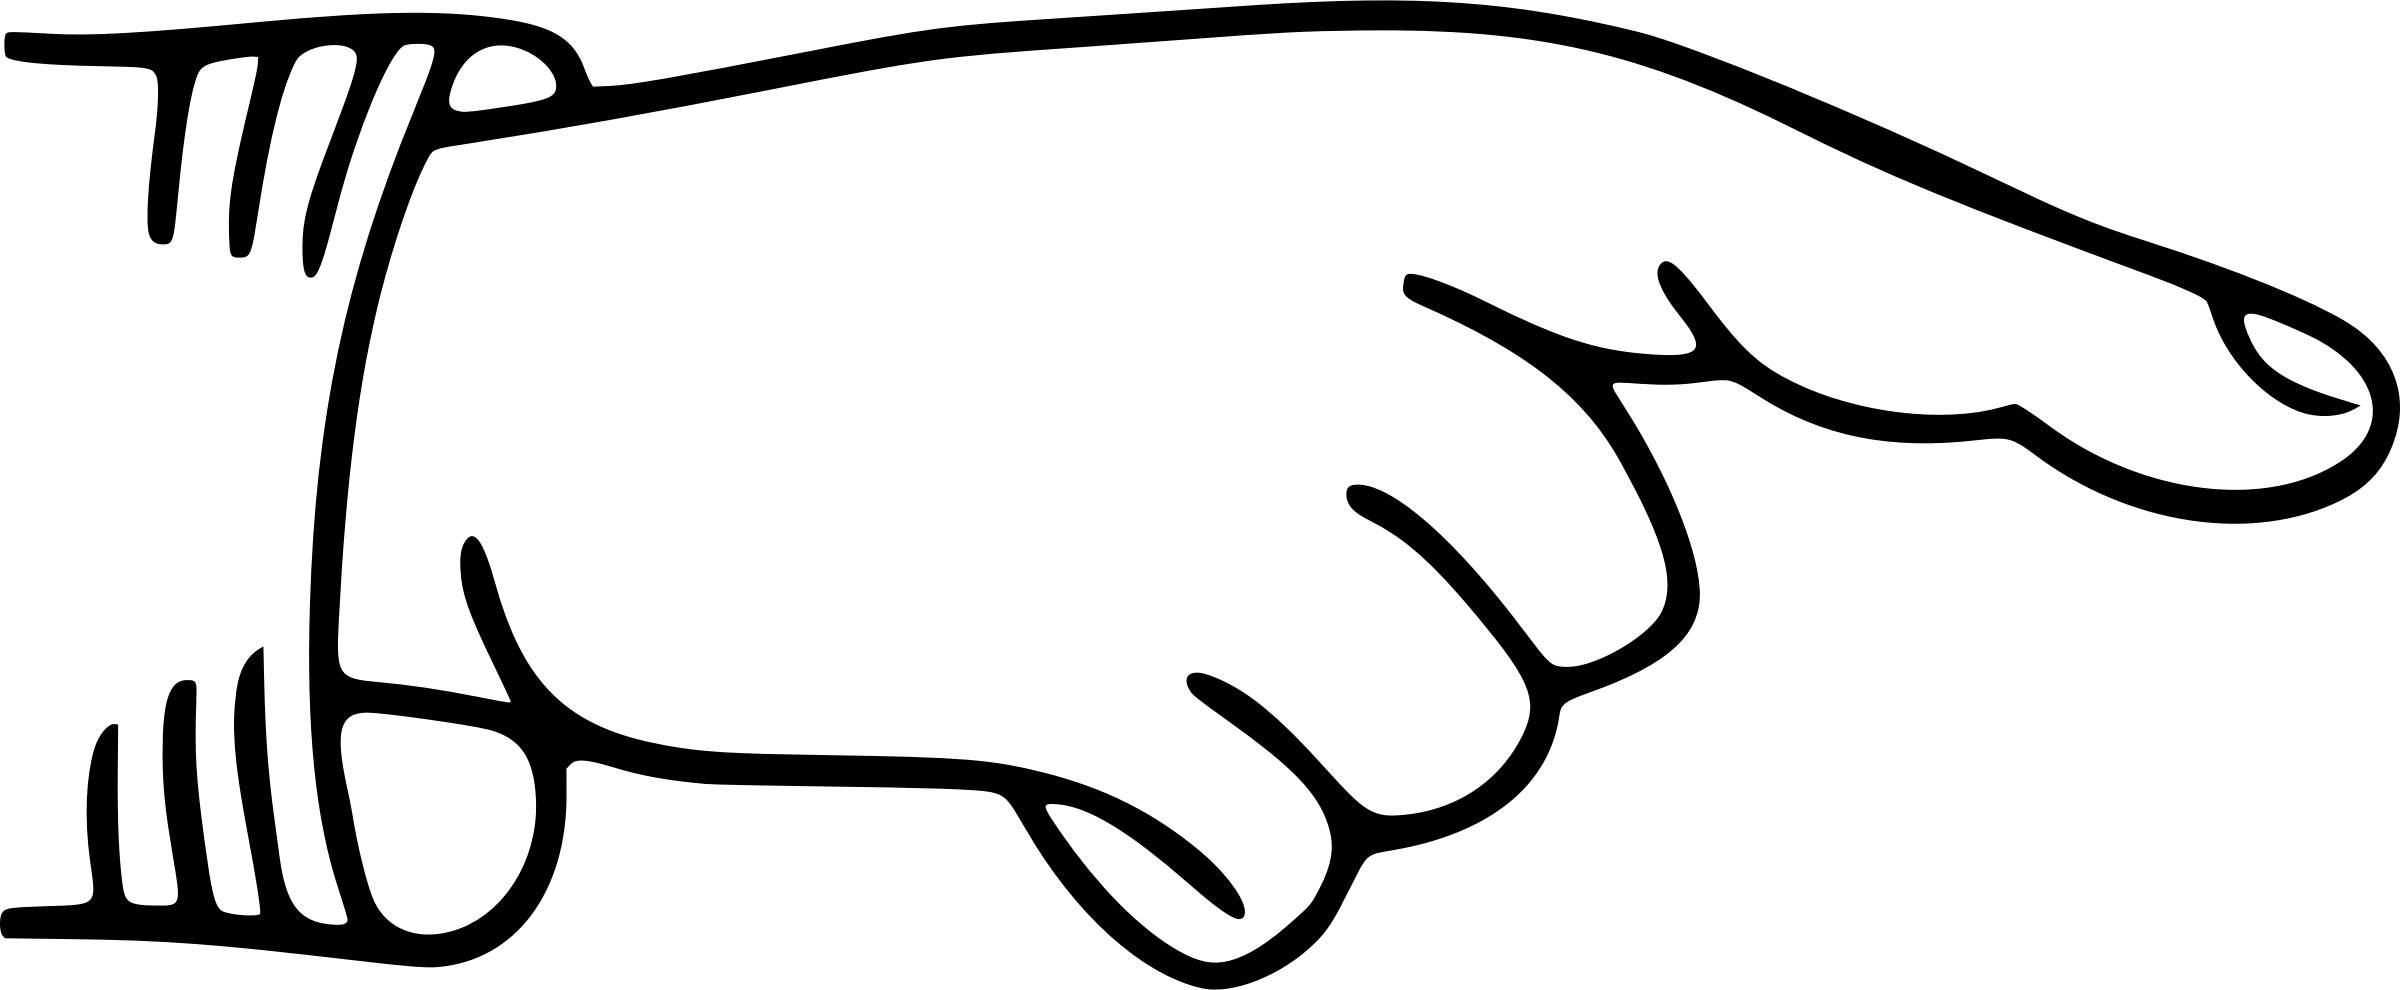 2400x990 Clipart